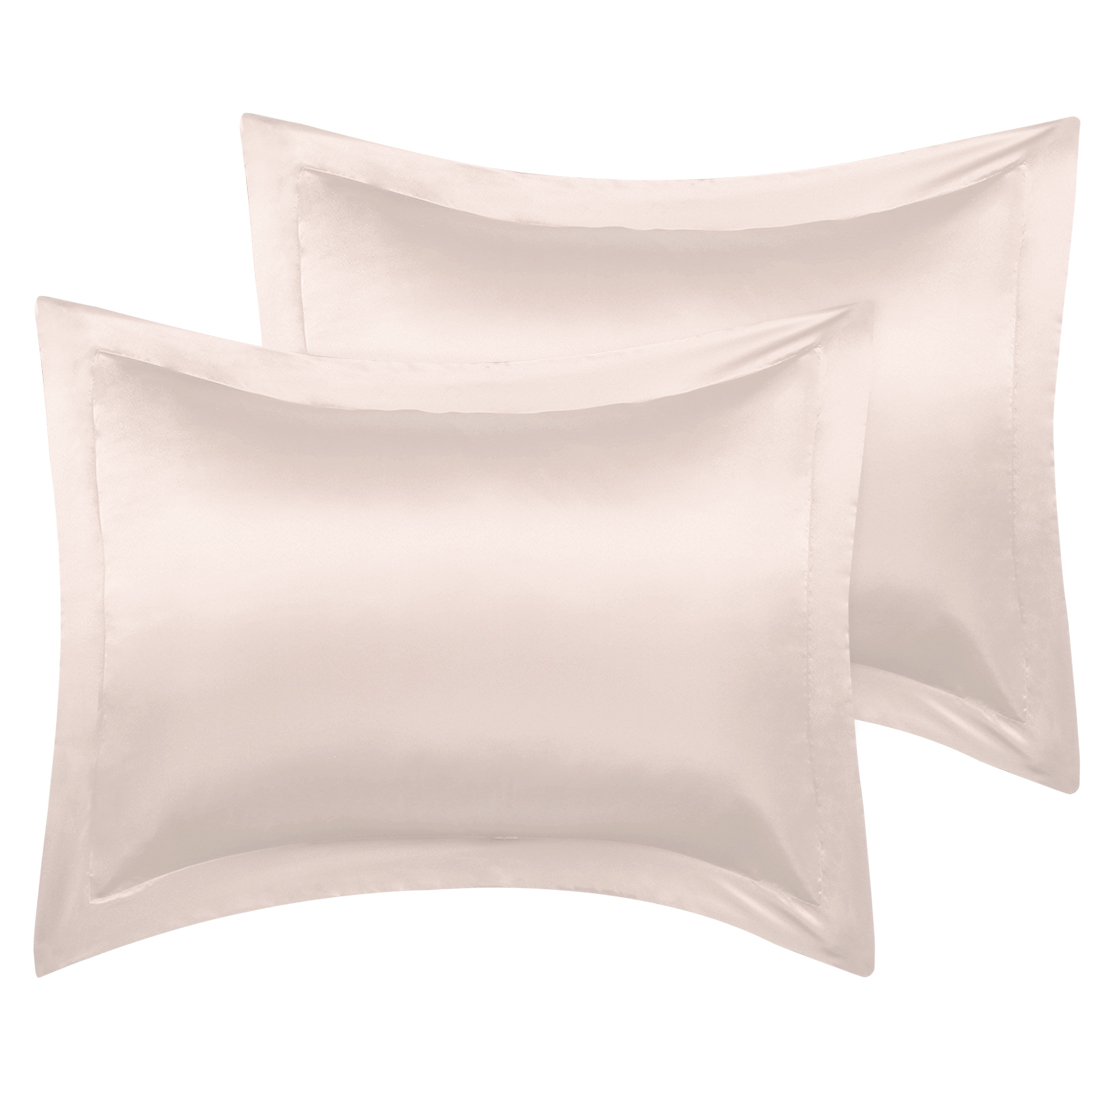 2 Pcs Light Tan Pillow Shams Satin Pillow Cases Standard Oxford Pillowcases